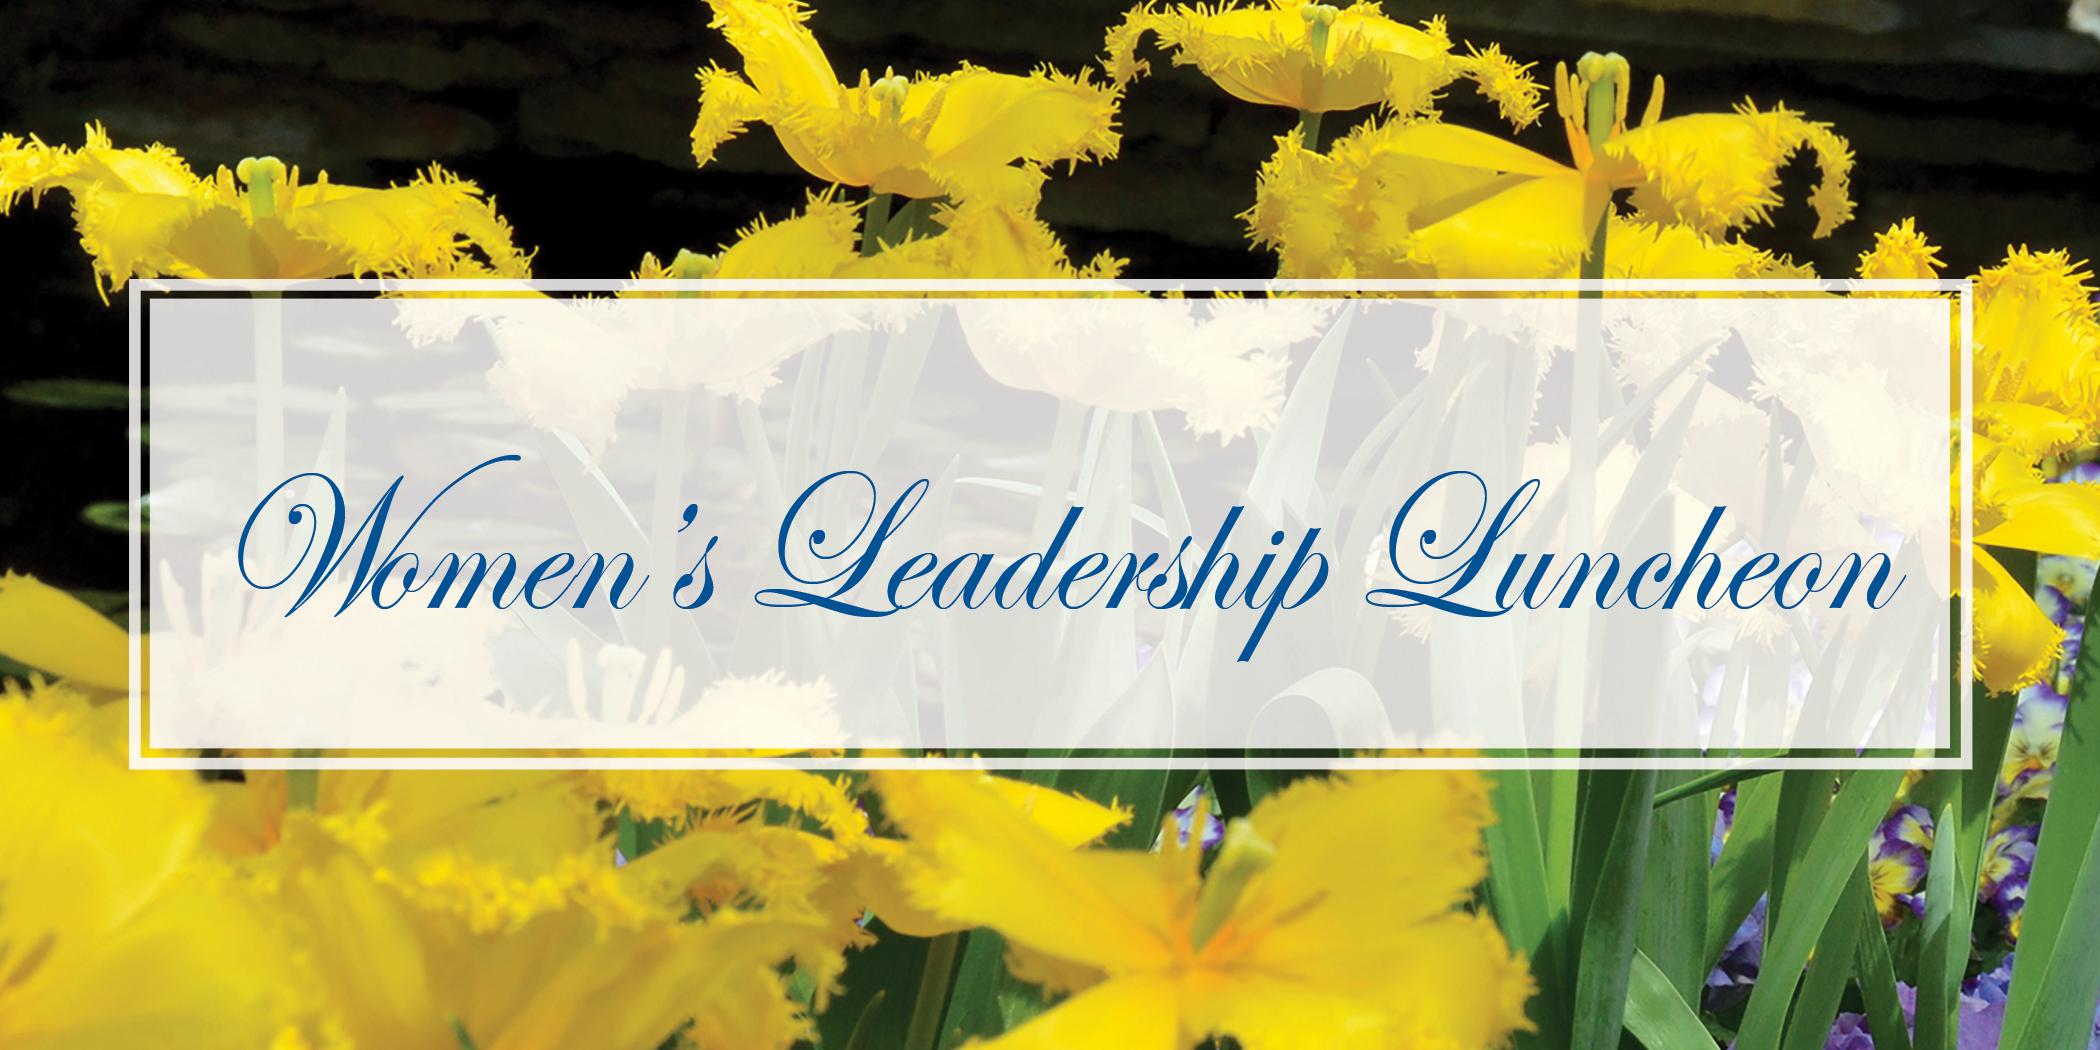 Women's Leadership Luncheon header for 2018